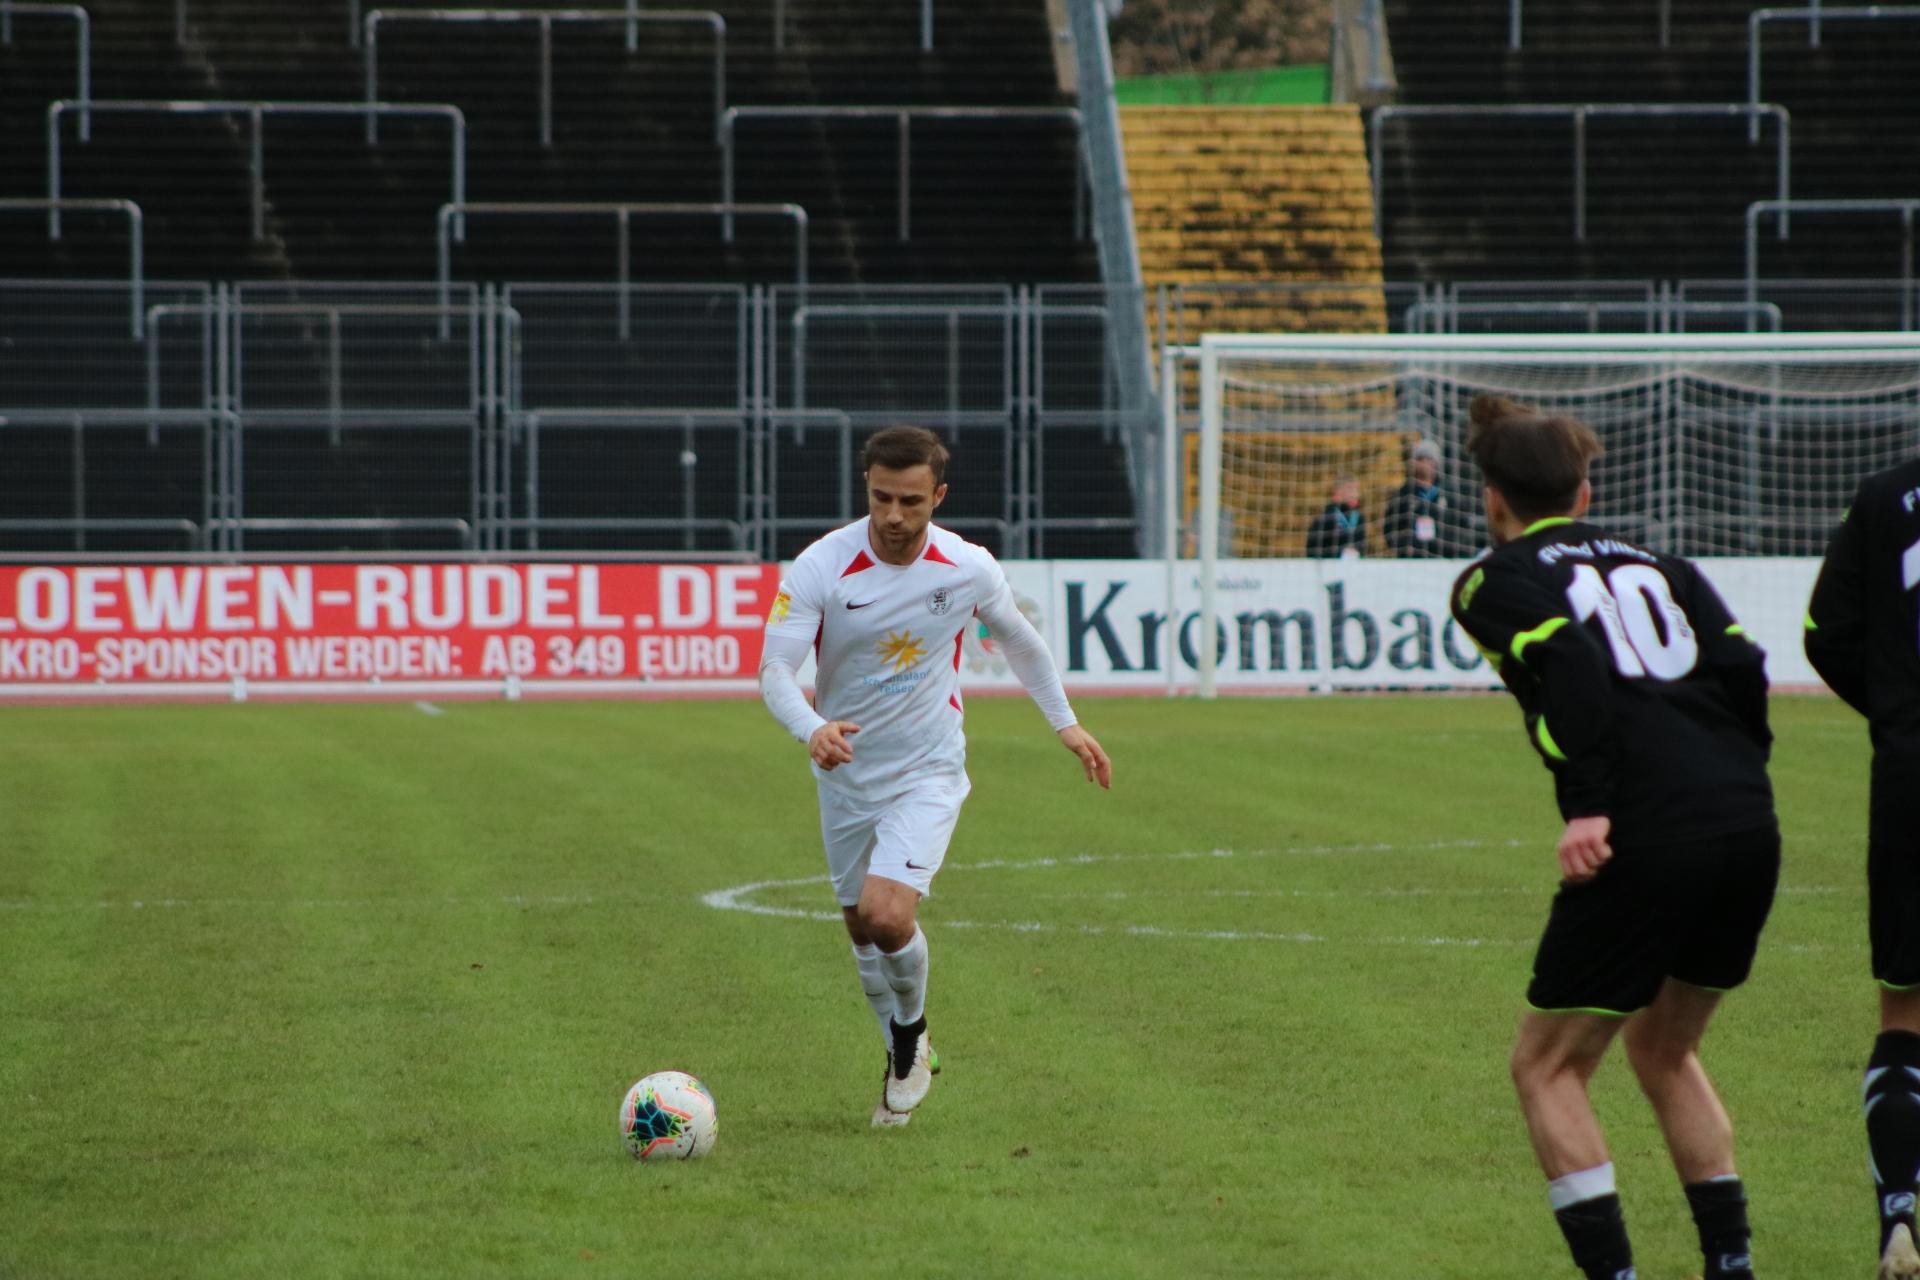 Lotto Hessenliga 2019/2020, KSV Hessen Kassel, FV Bad Vilbel, Endstand 6:1, Alban Meha (KSV Hessen Kassel)